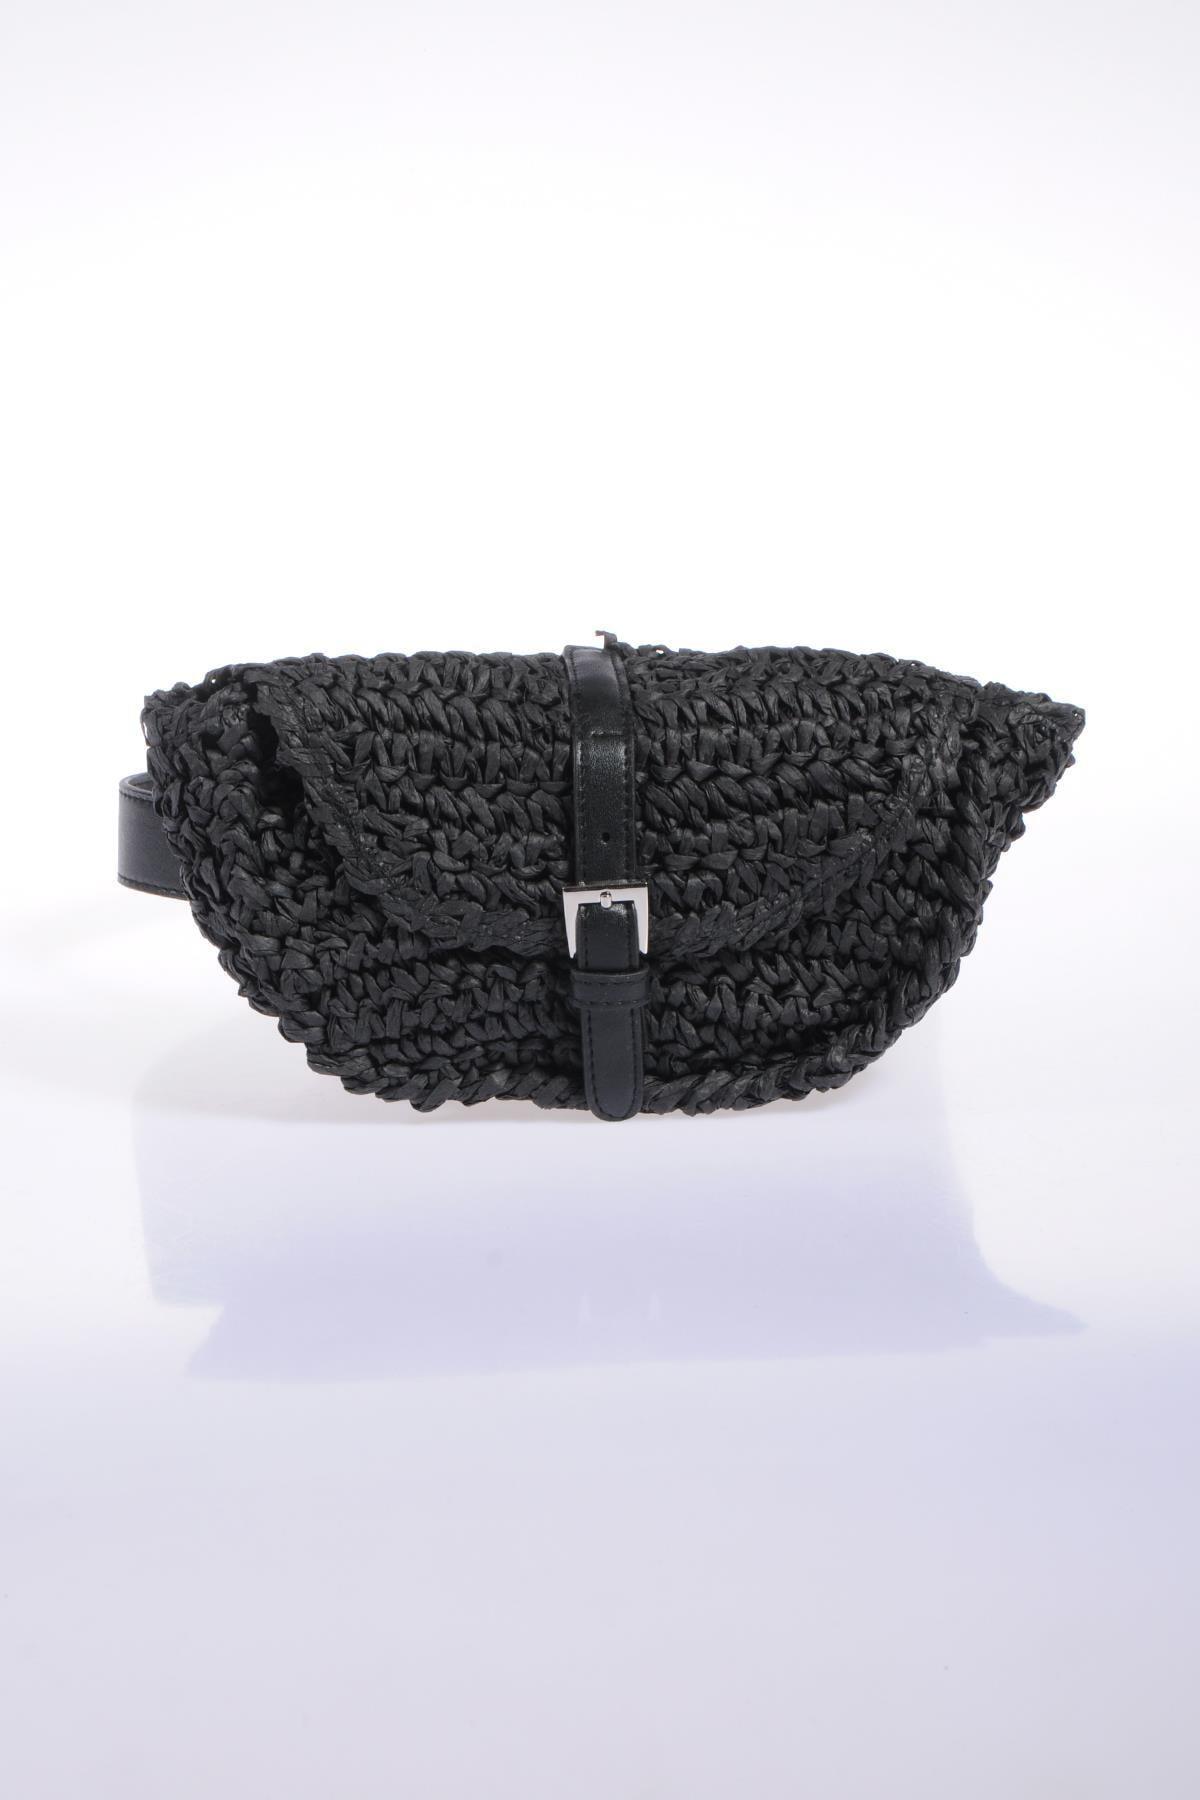 Sergio Giorgianni Kadın Siyah Bel Çantası sghsr1028-siyah